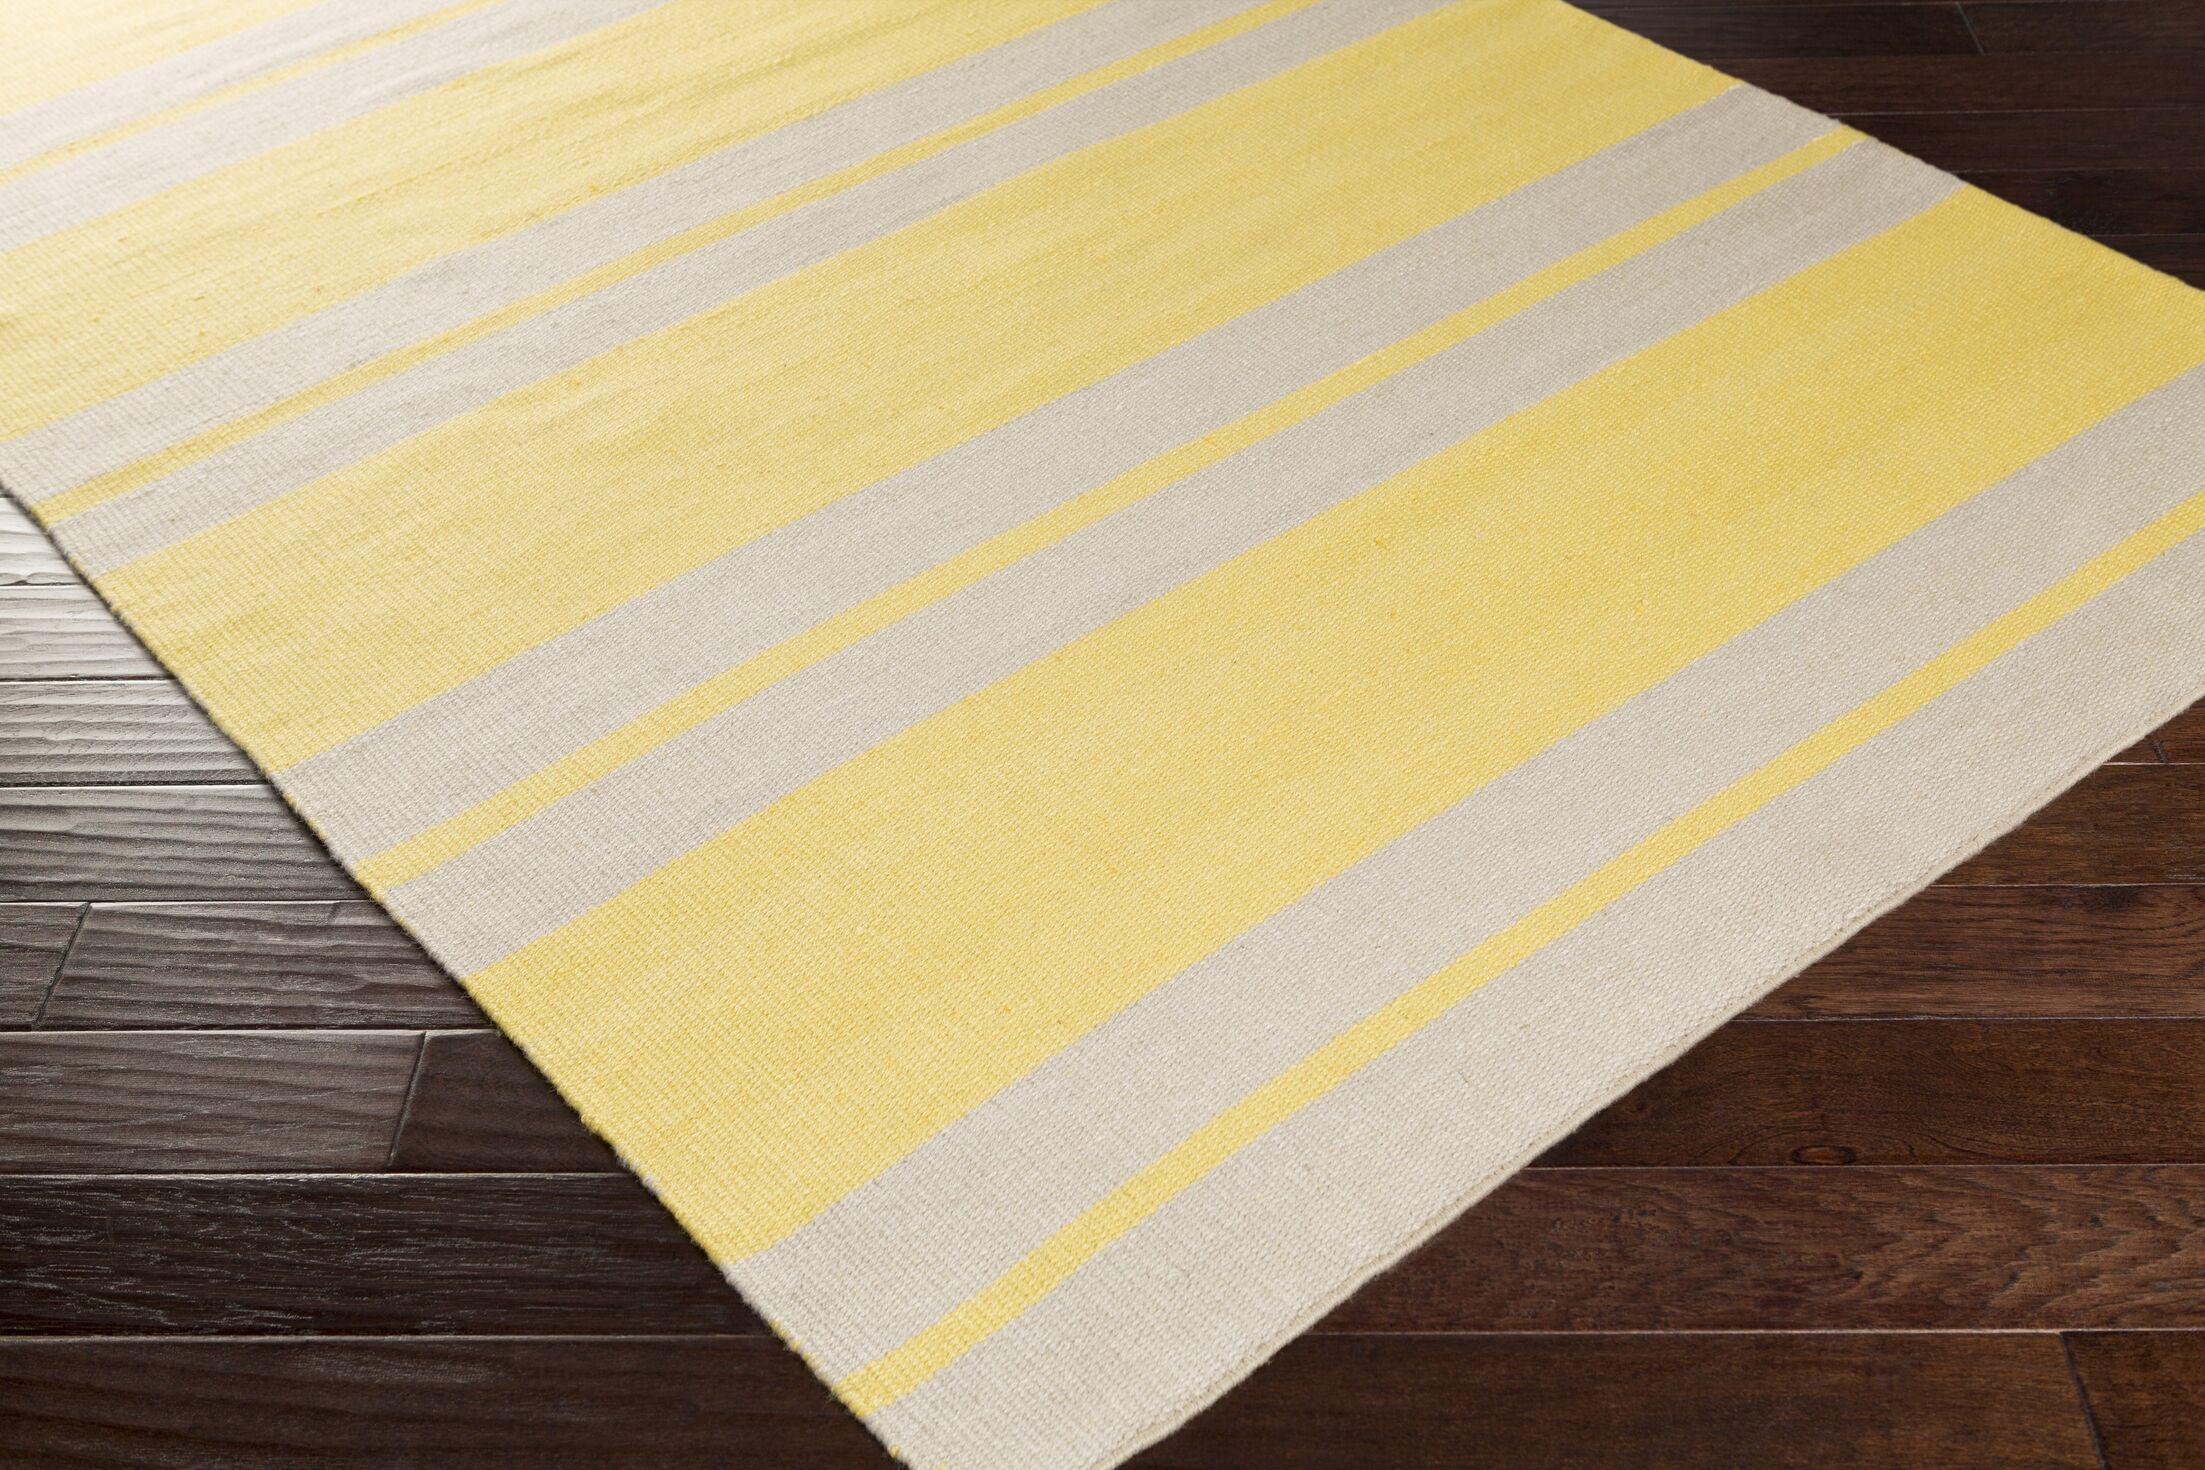 Makrasyka Hand Woven Gold Indoor/Outdoor Area Rug Rug Size: Rectangle 5' x 7'6